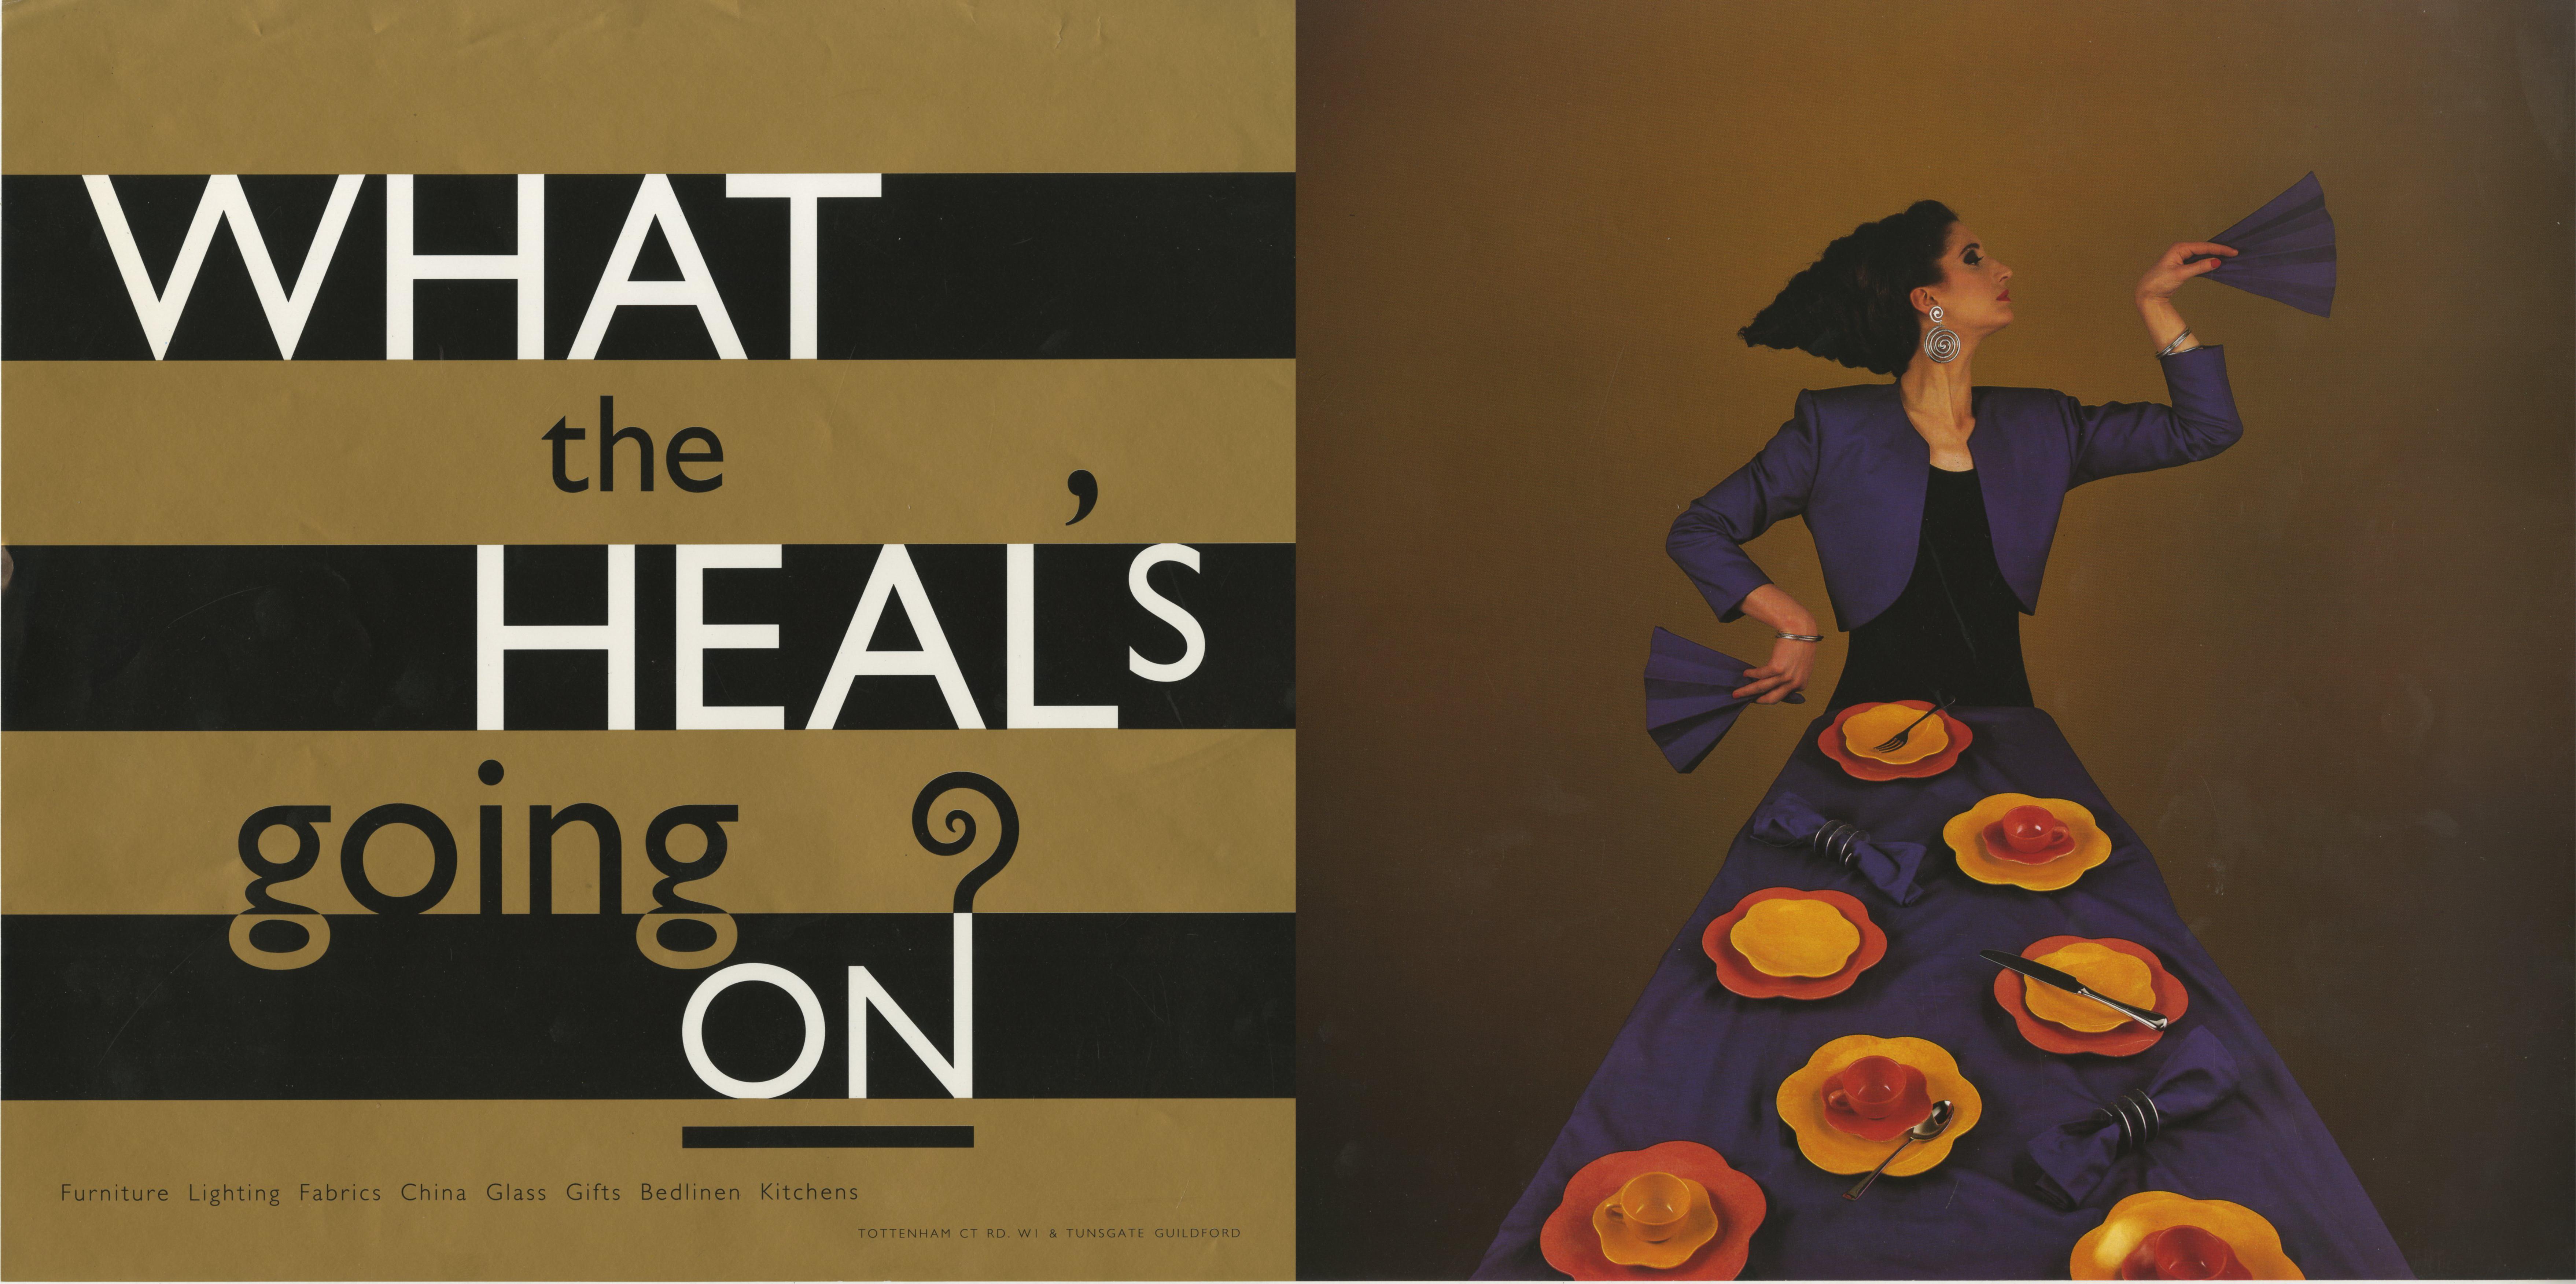 'Table' Heals, Mark Reddy, Ayer.jpg